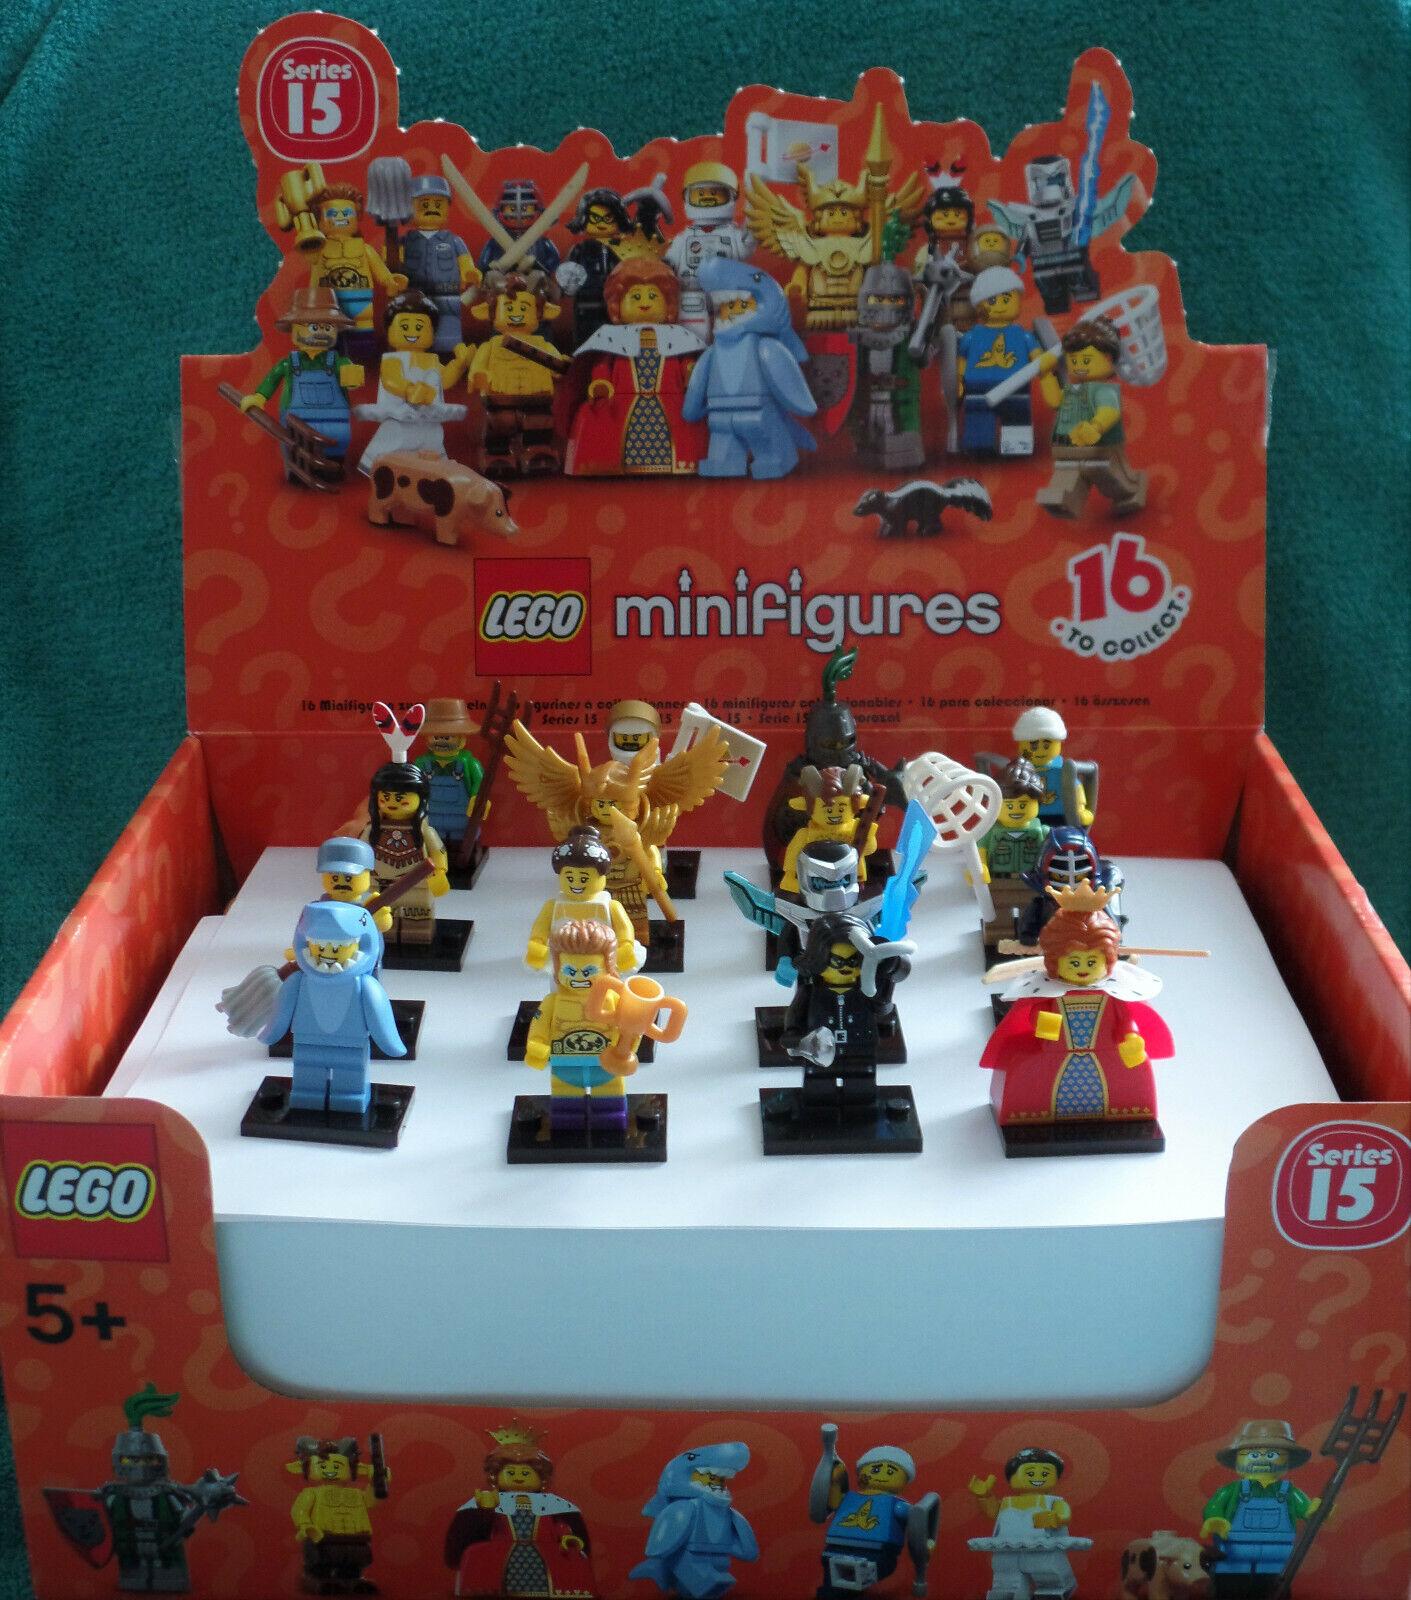 71011 LEGO® Minifigures (Komplettsatz) Serie 15 - Mit dem Display